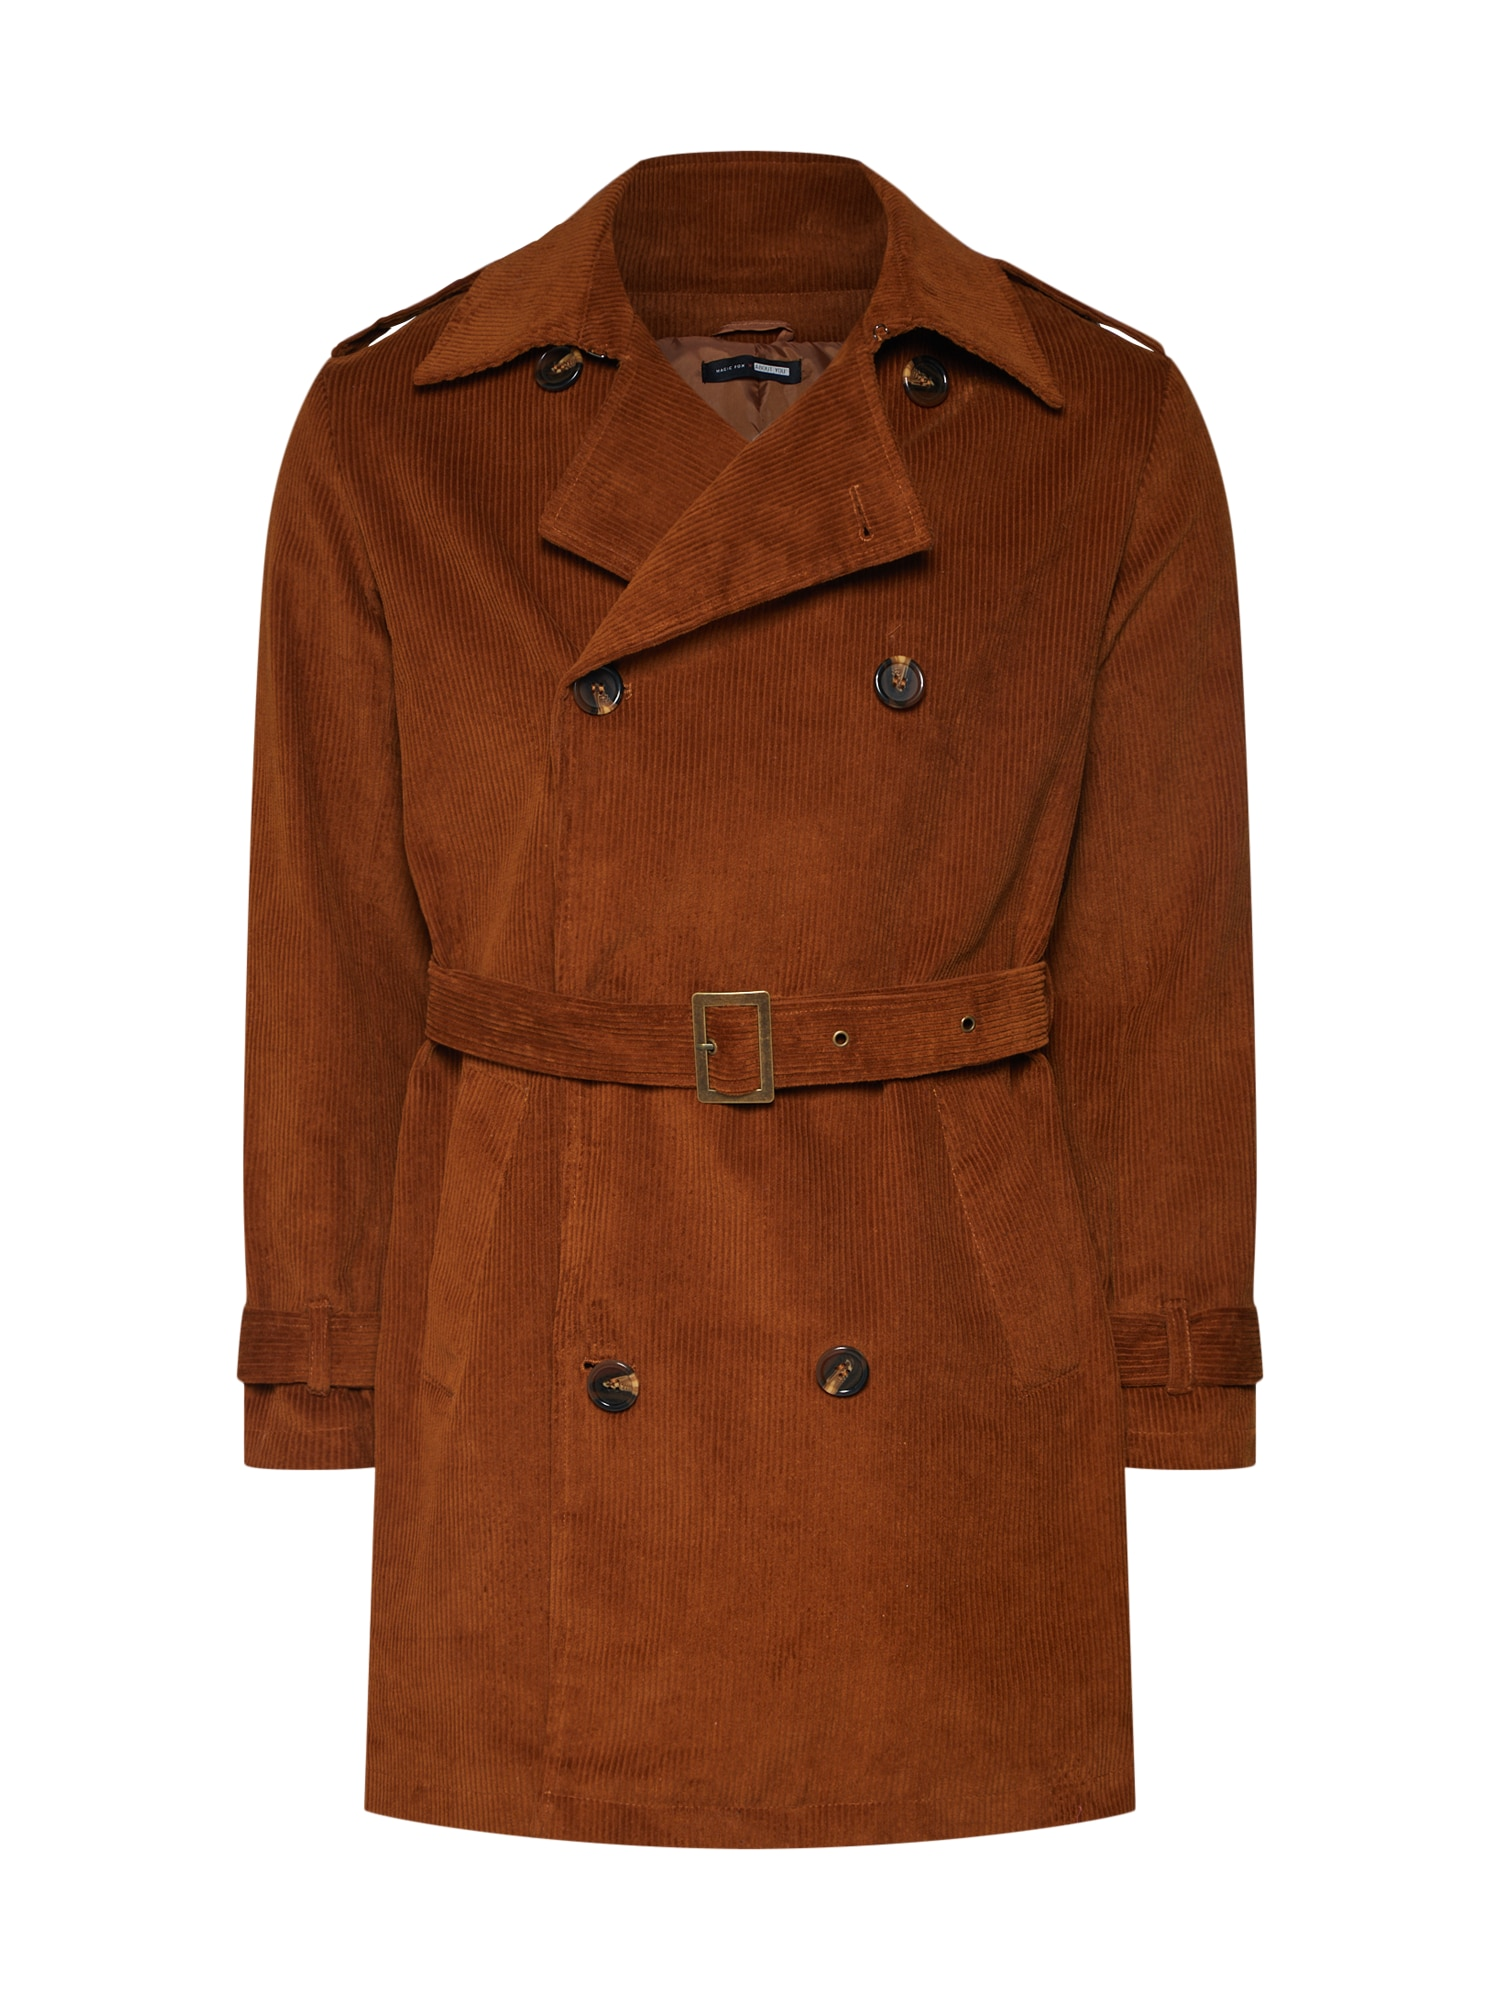 ABOUT YOU x Magic Fox Rudeninis-žieminis paltas 'Colin' ruda (konjako)